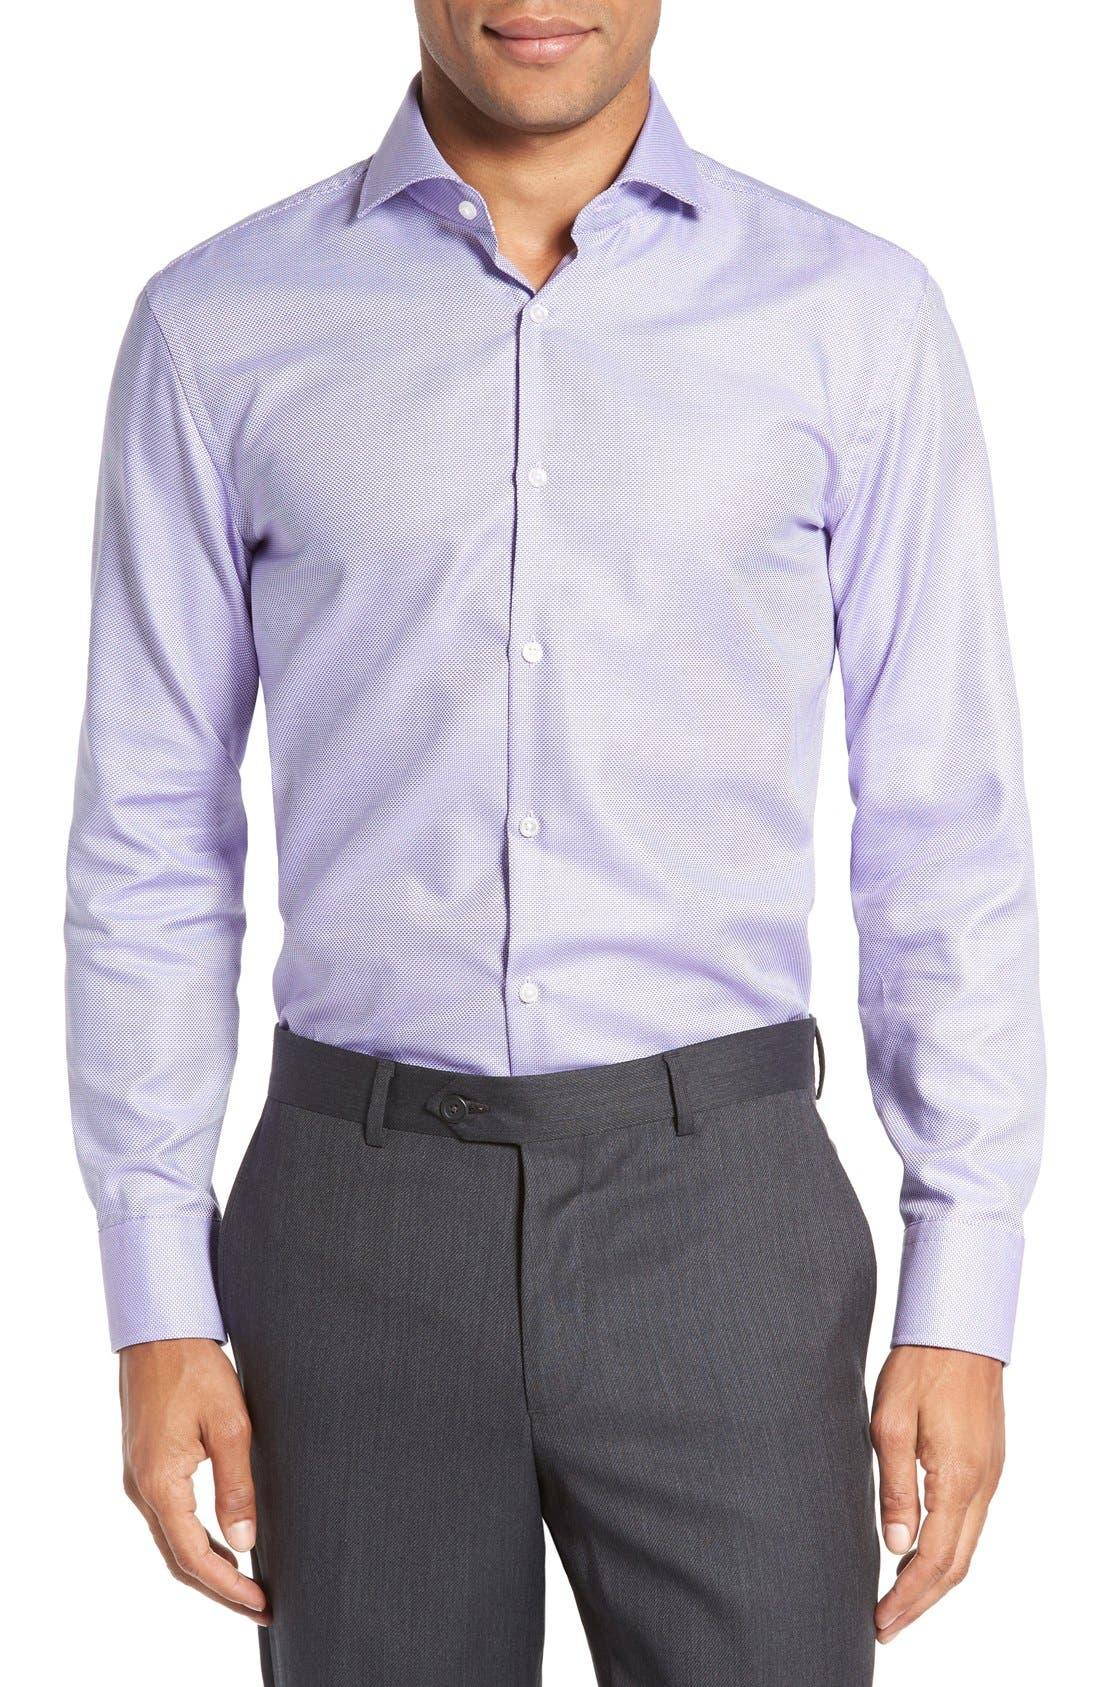 Main Image - BOSS Sharp Fit Dress Shirt